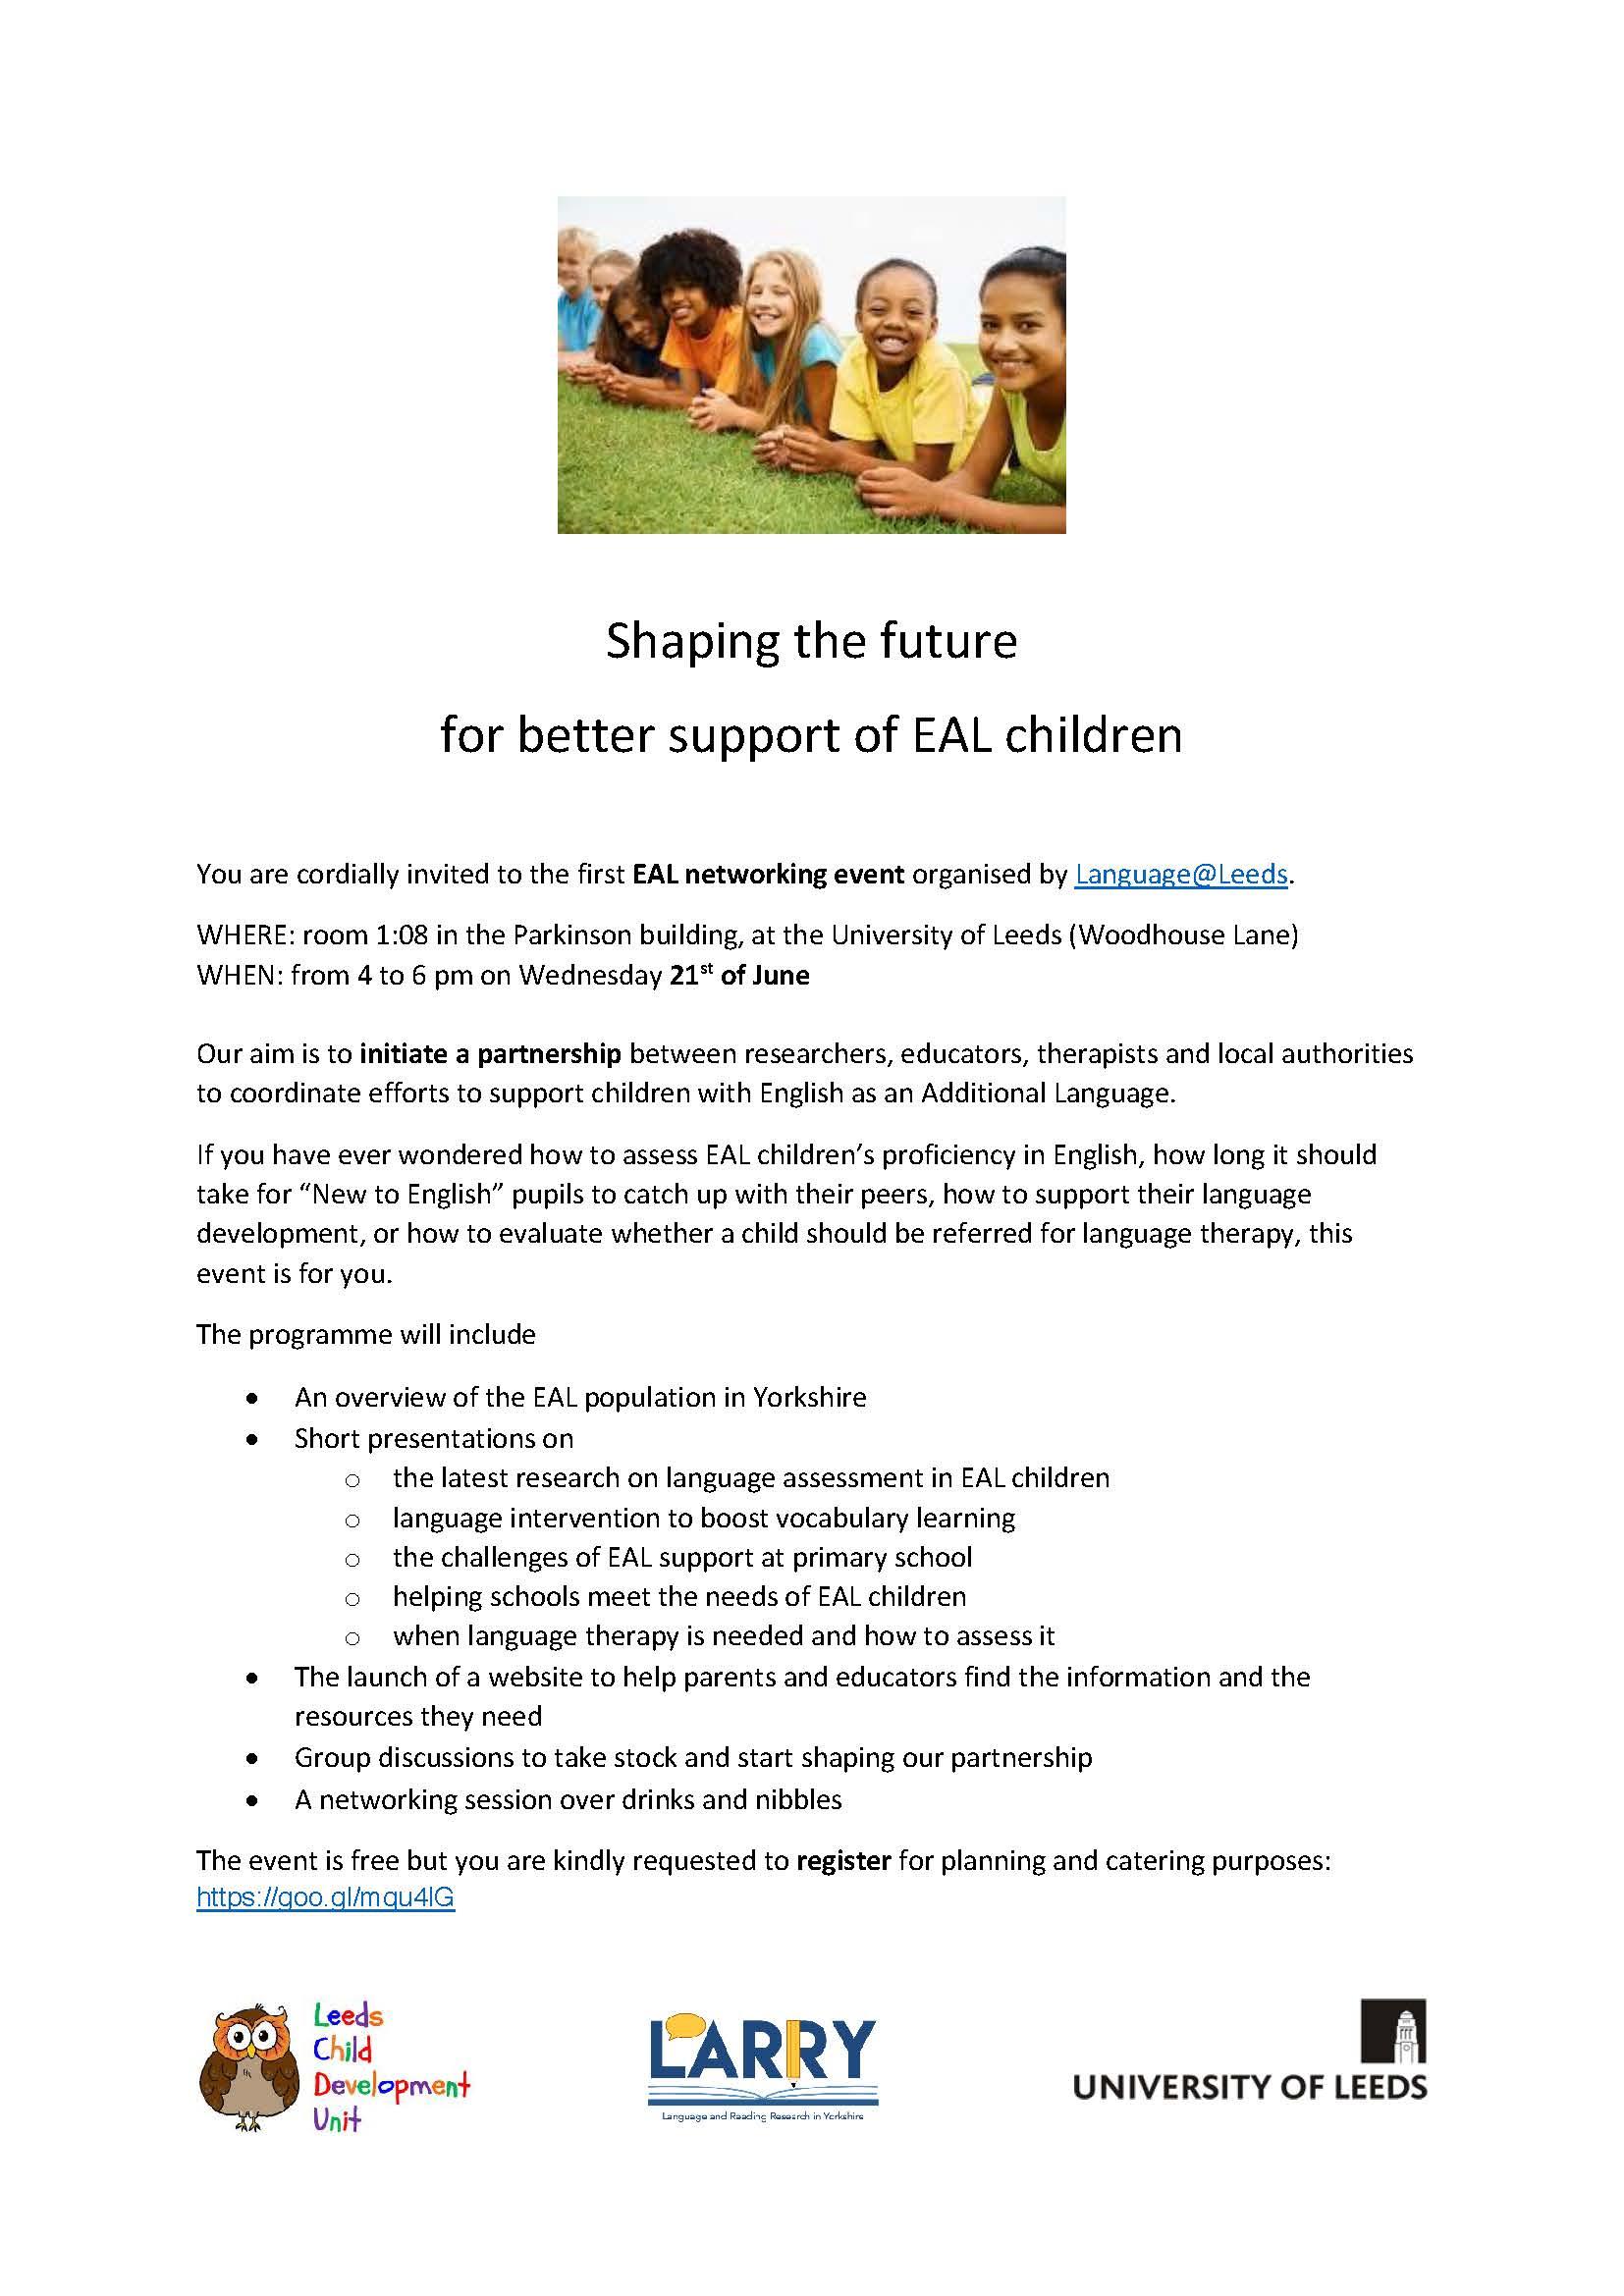 EAL_networking_event_June_2017_Invitation.jpg